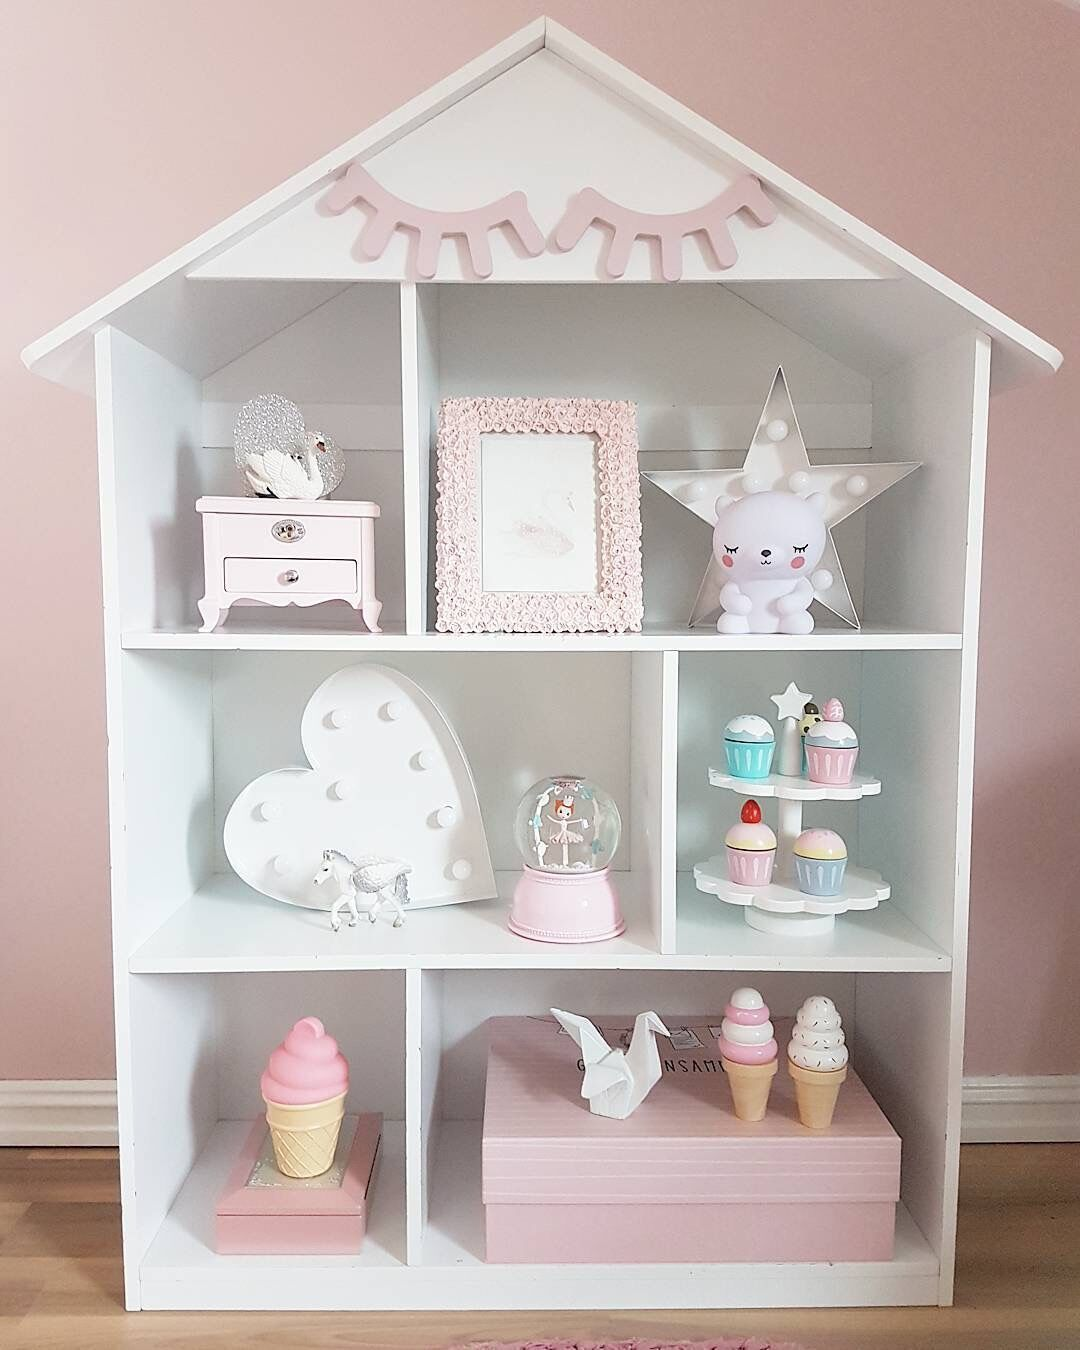 Boleyn Customizable Northern European-Style INS-Style Floor House Bookshelf CHILDREN'S Room Baby Room Storage Decoration Solid W